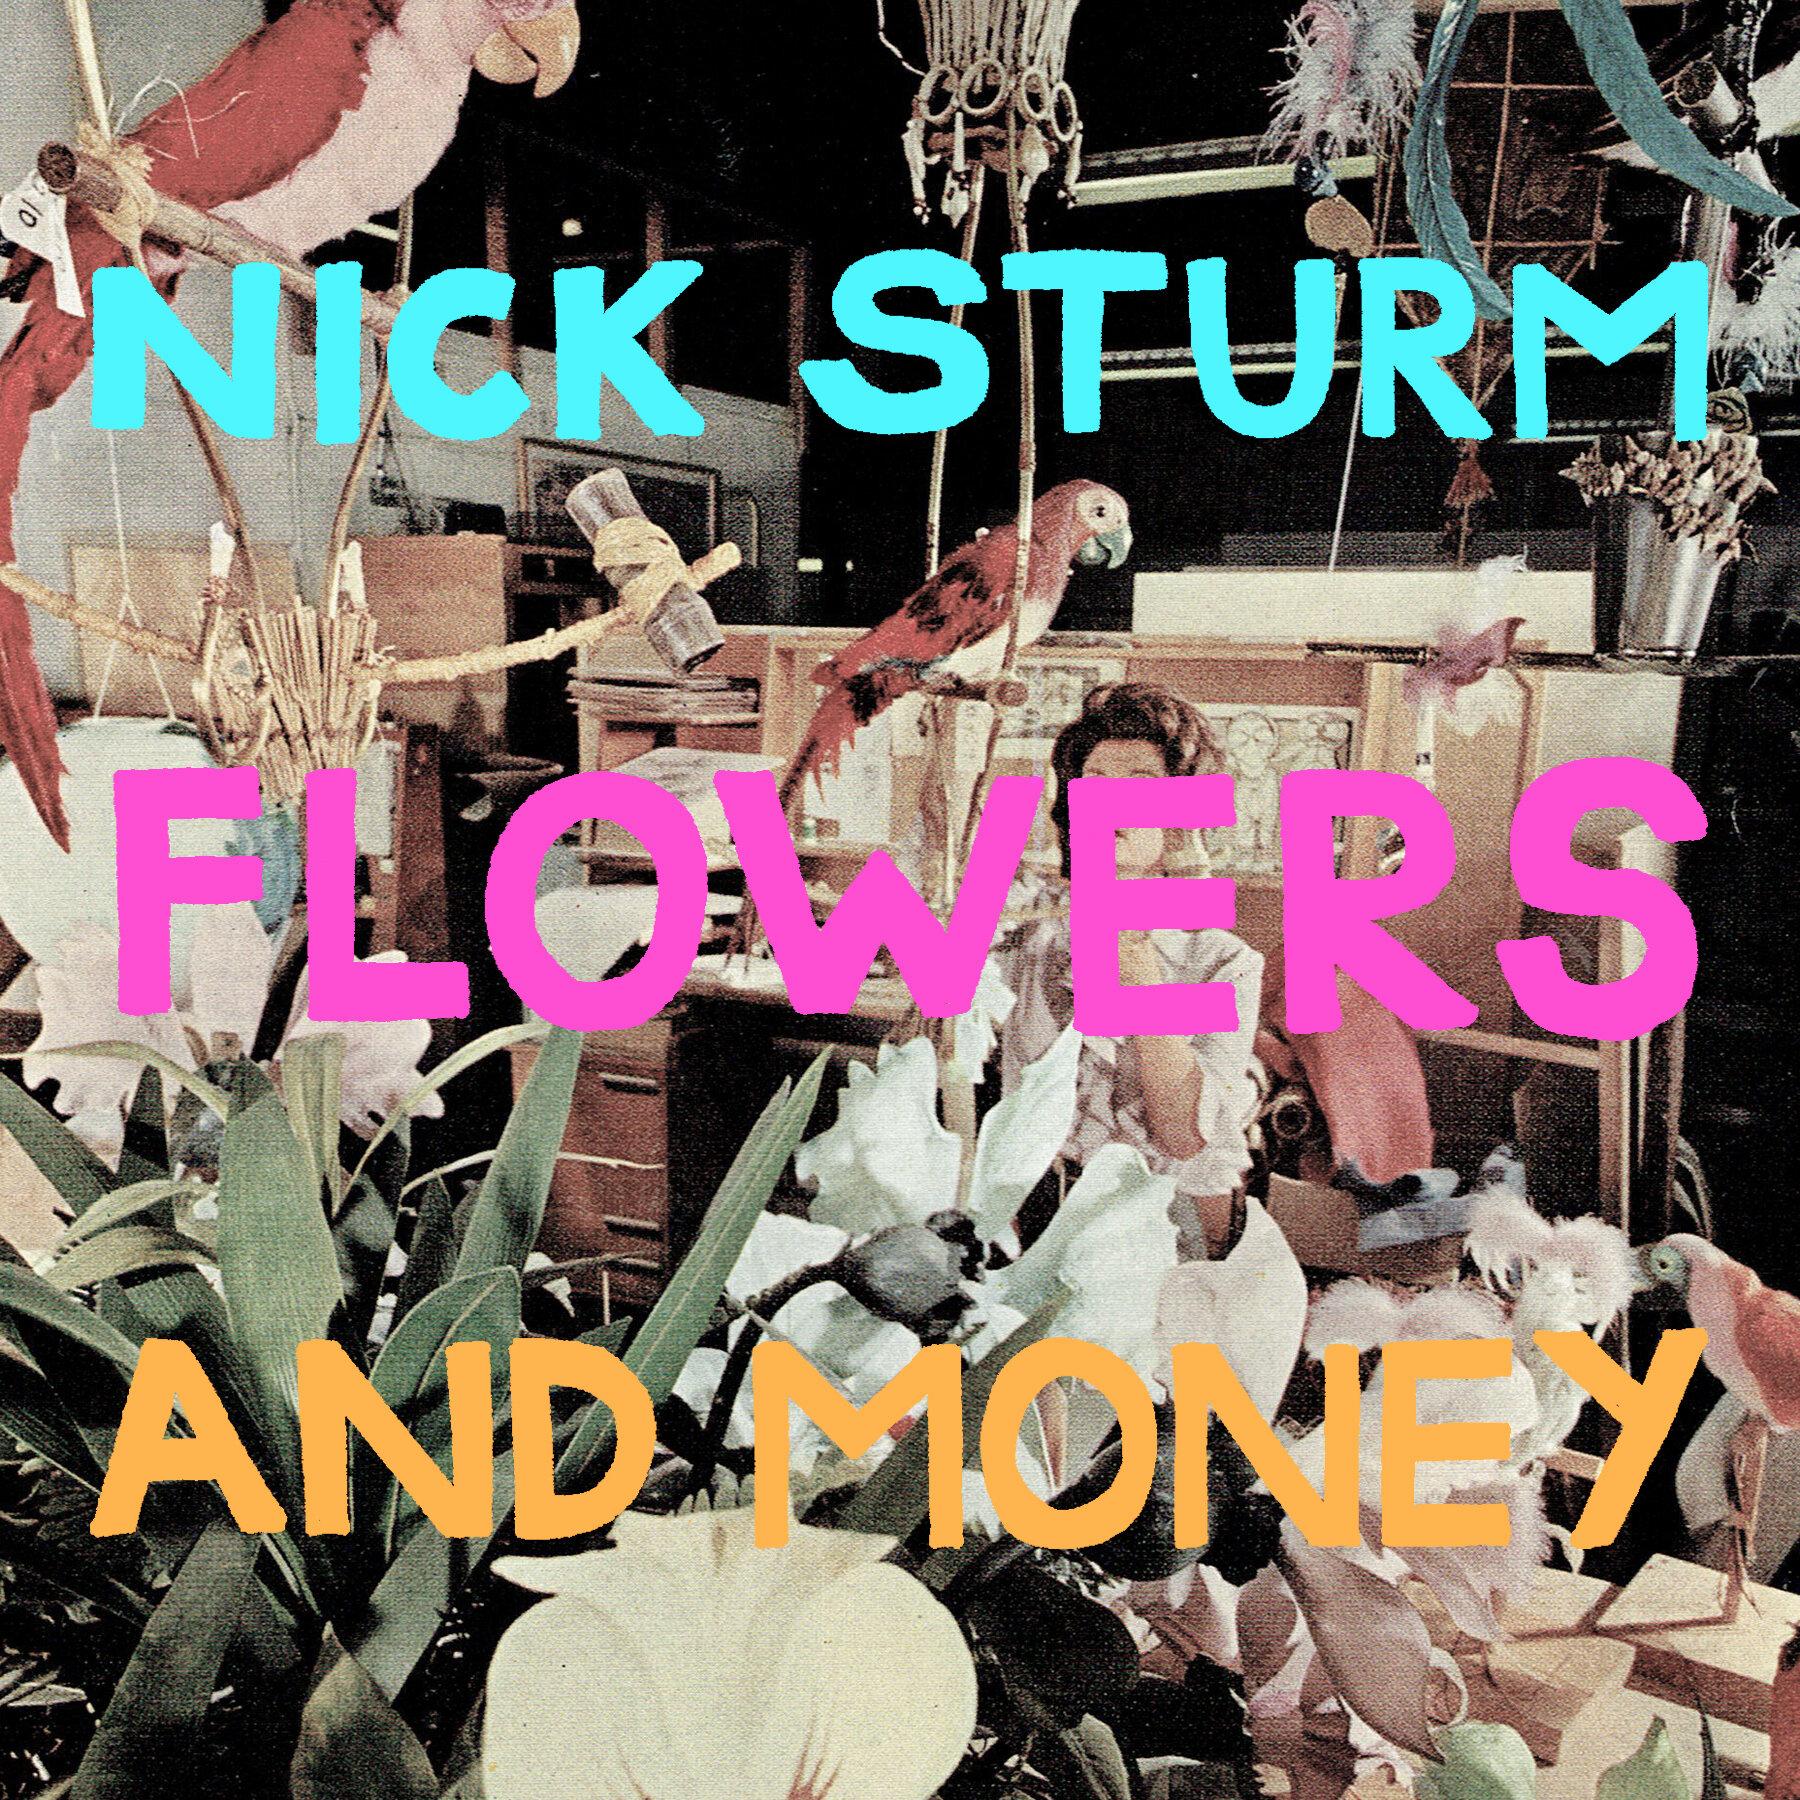 Audio chapbook from Black Cake Records:  https://blackcake.org/album/flowers-and-money